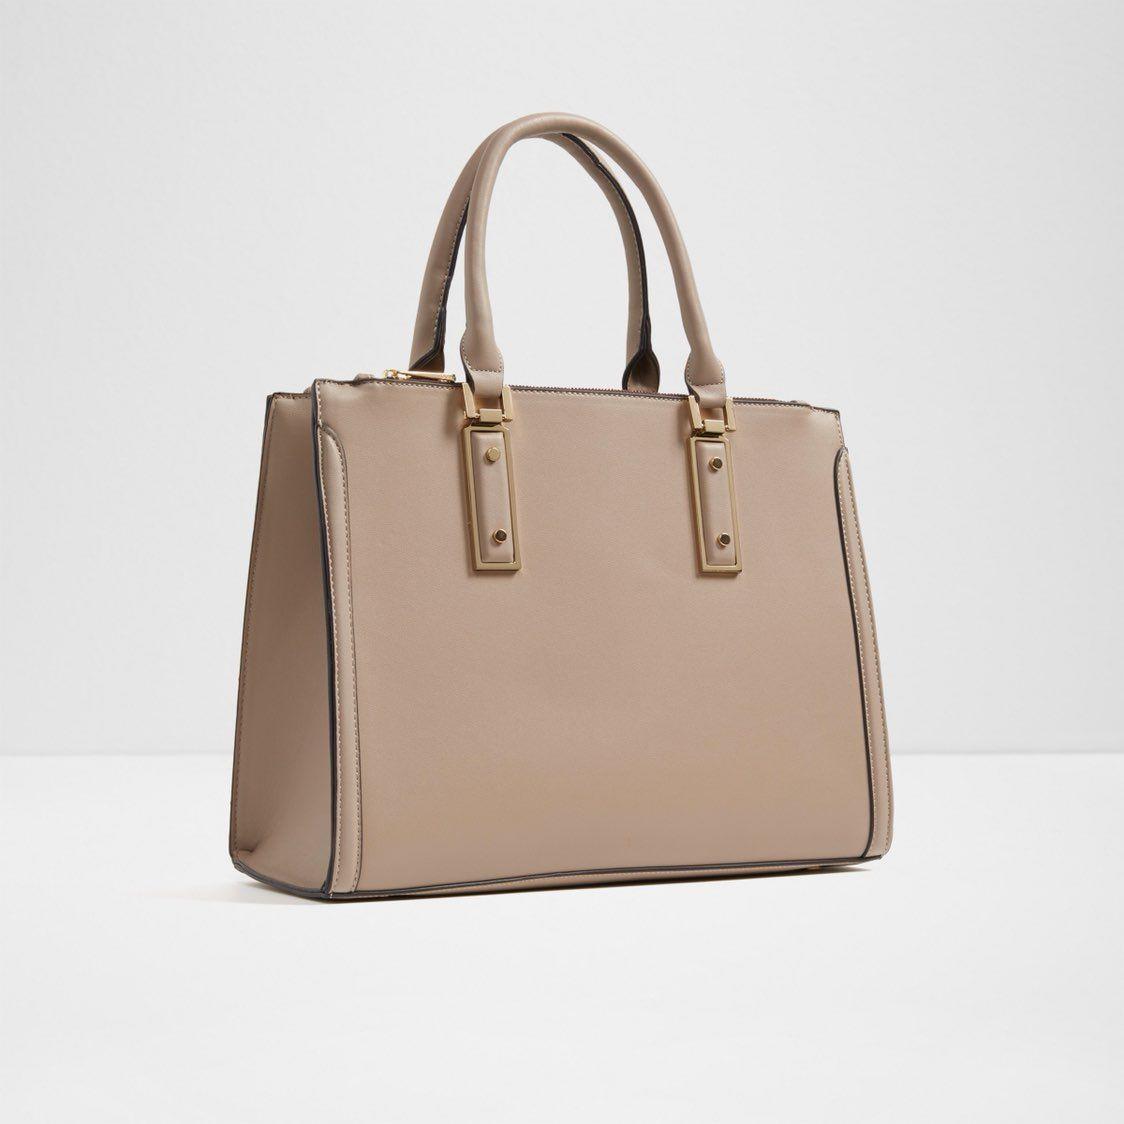 Aldo Deroleri Choose Color With Images Top Handbags Things To